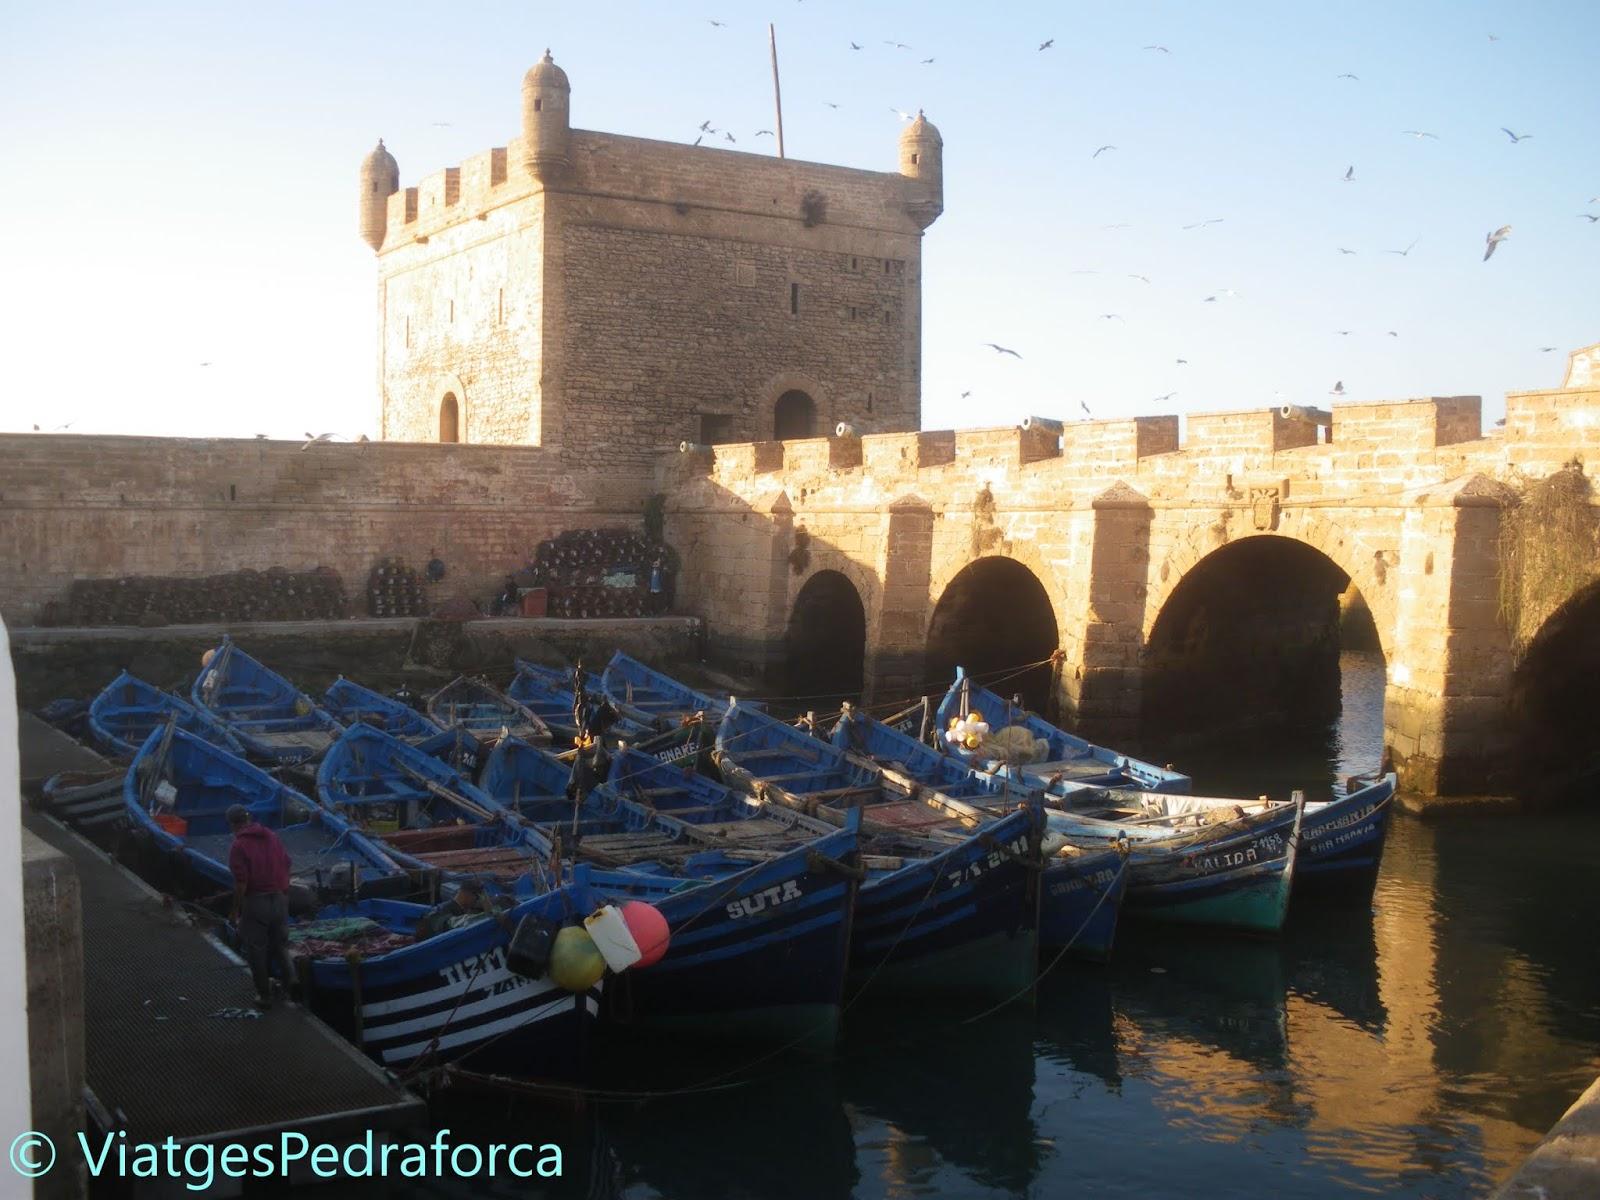 Marroc, Medina d'Essaouira, Patrimoni de la Humanitat, Unesco Heritage